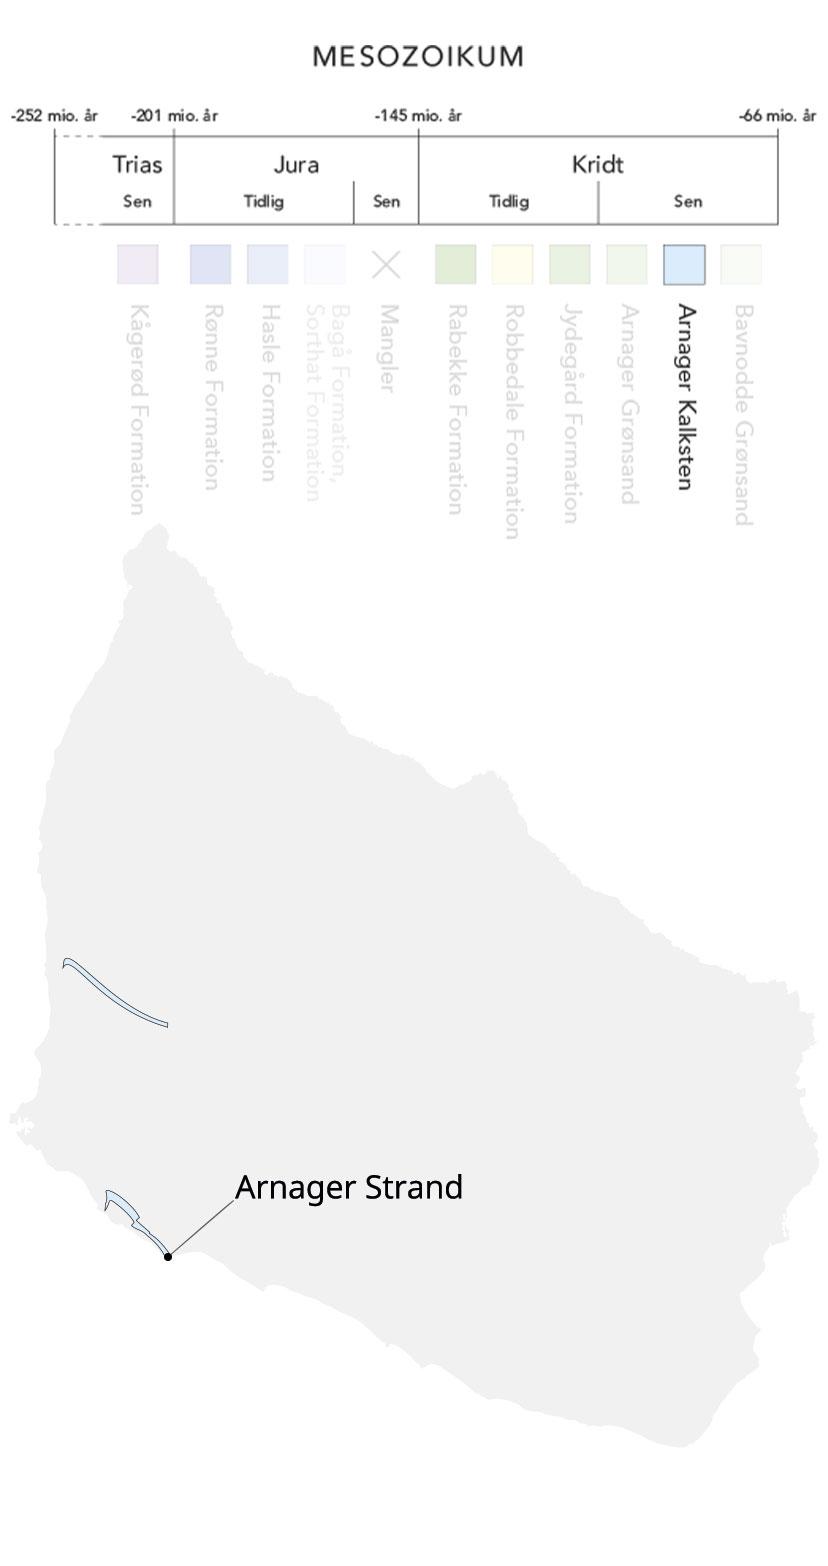 Kort over Bornholm og Arnager kalksten